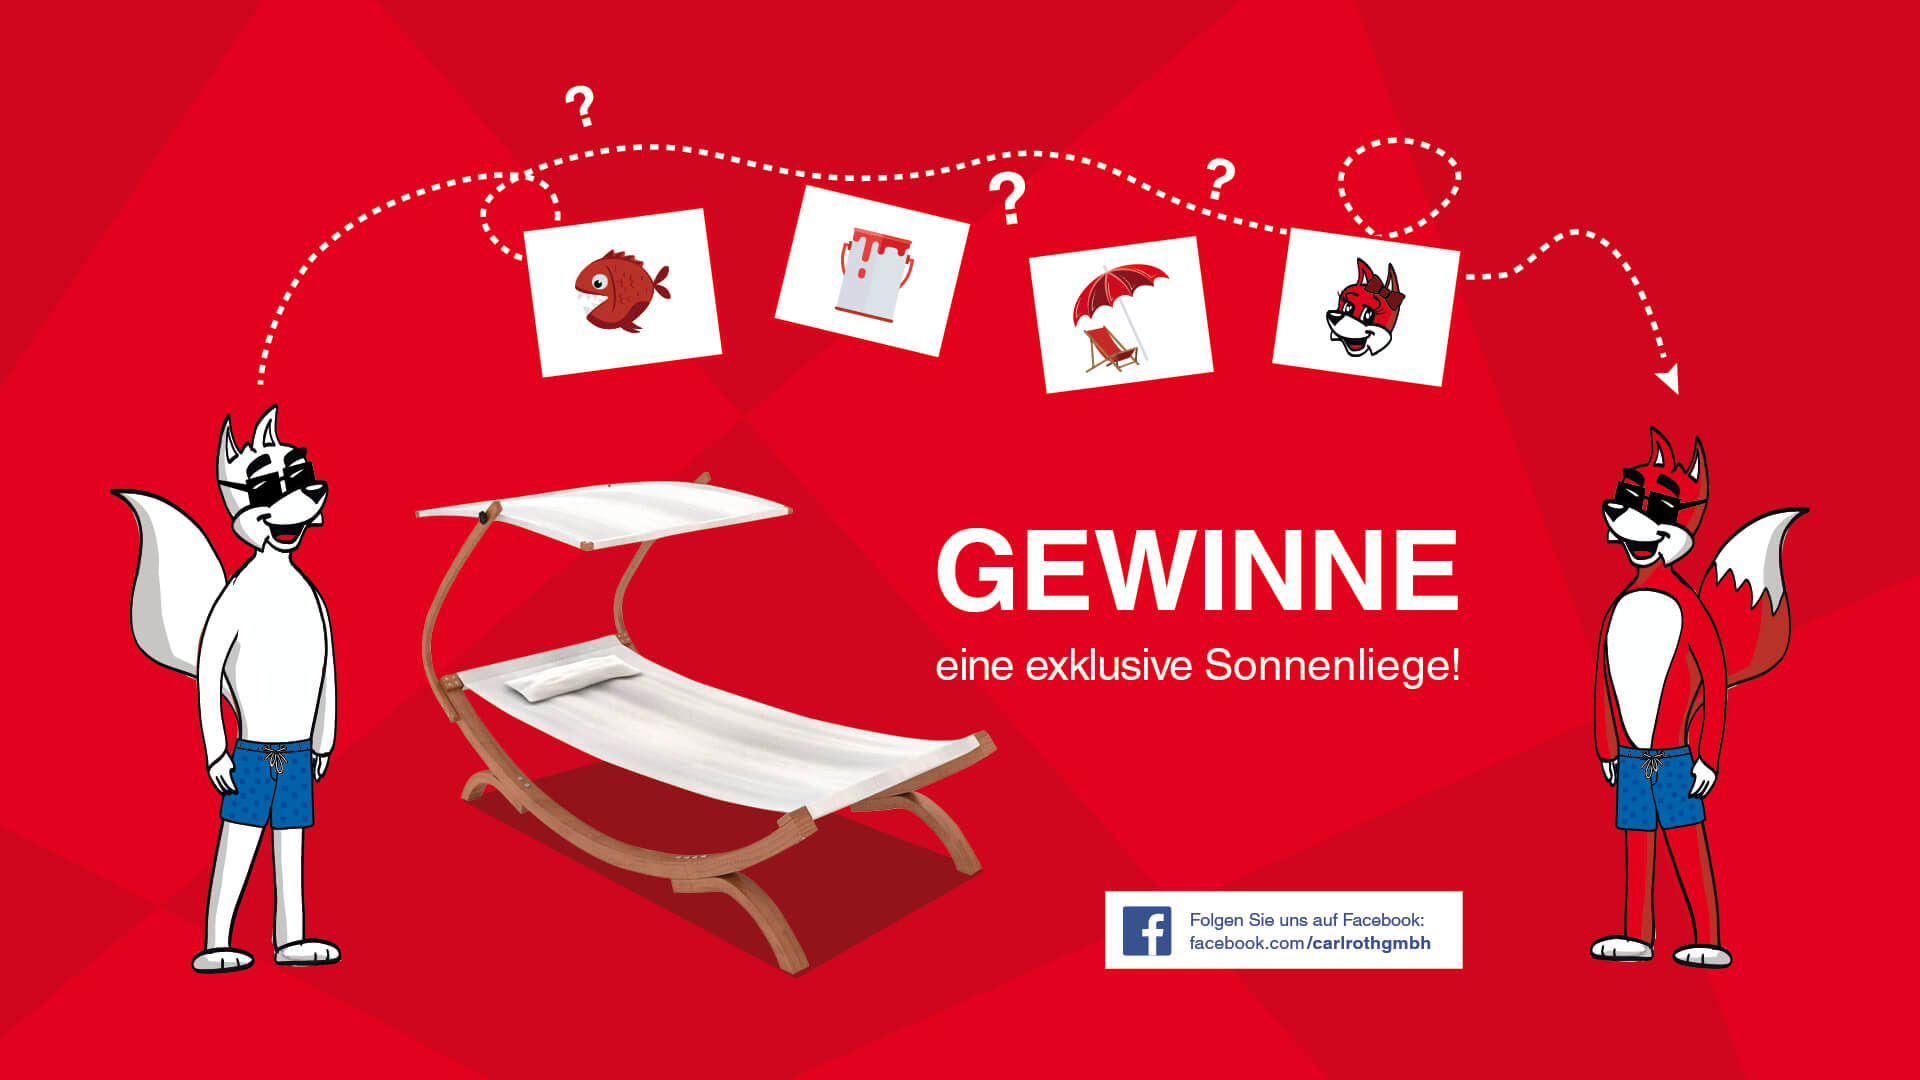 Gewinnspiel-Carl-Roth-Roth-Fux-Preis-Sonnenliege